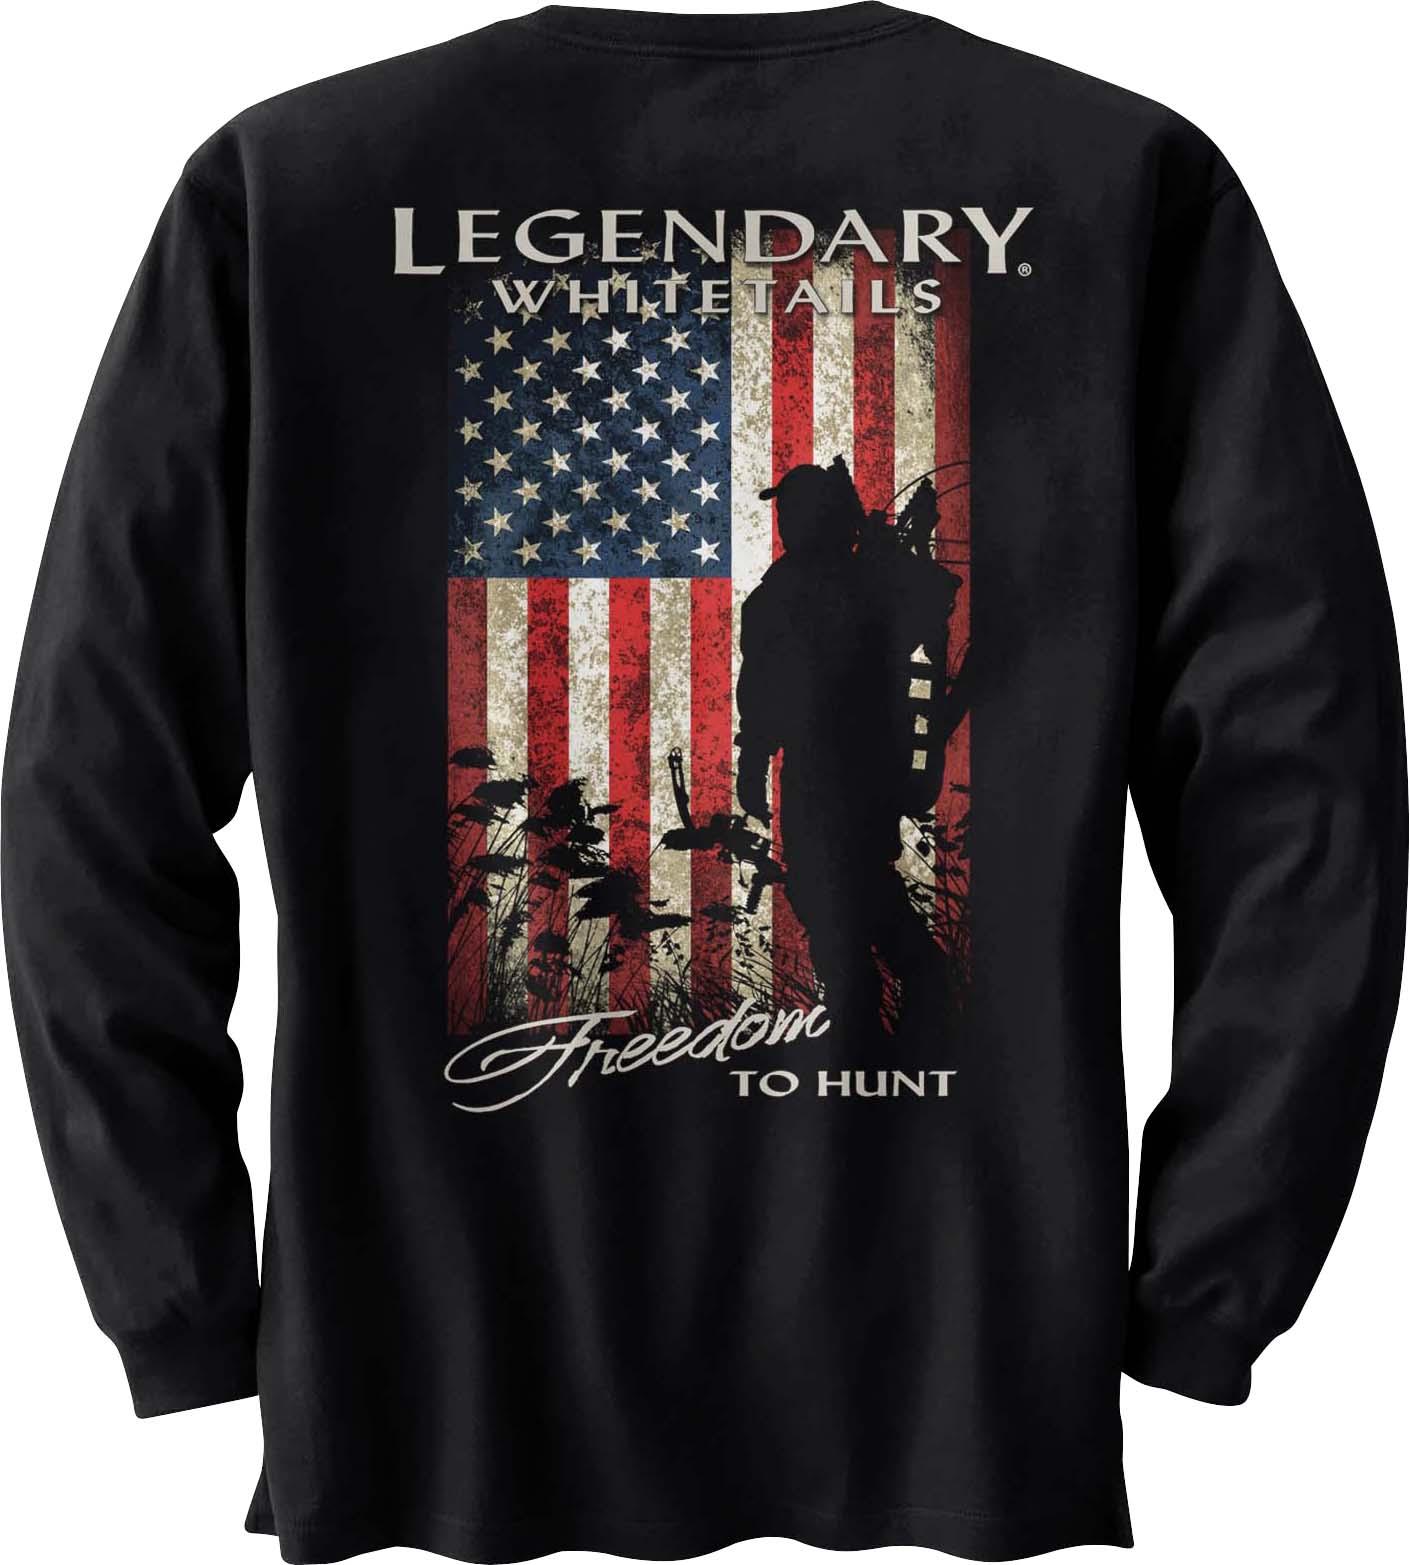 9720b9aea132 Men's Freedom to Hunt Long Sleeve T-shirt | Legendary Whitetails